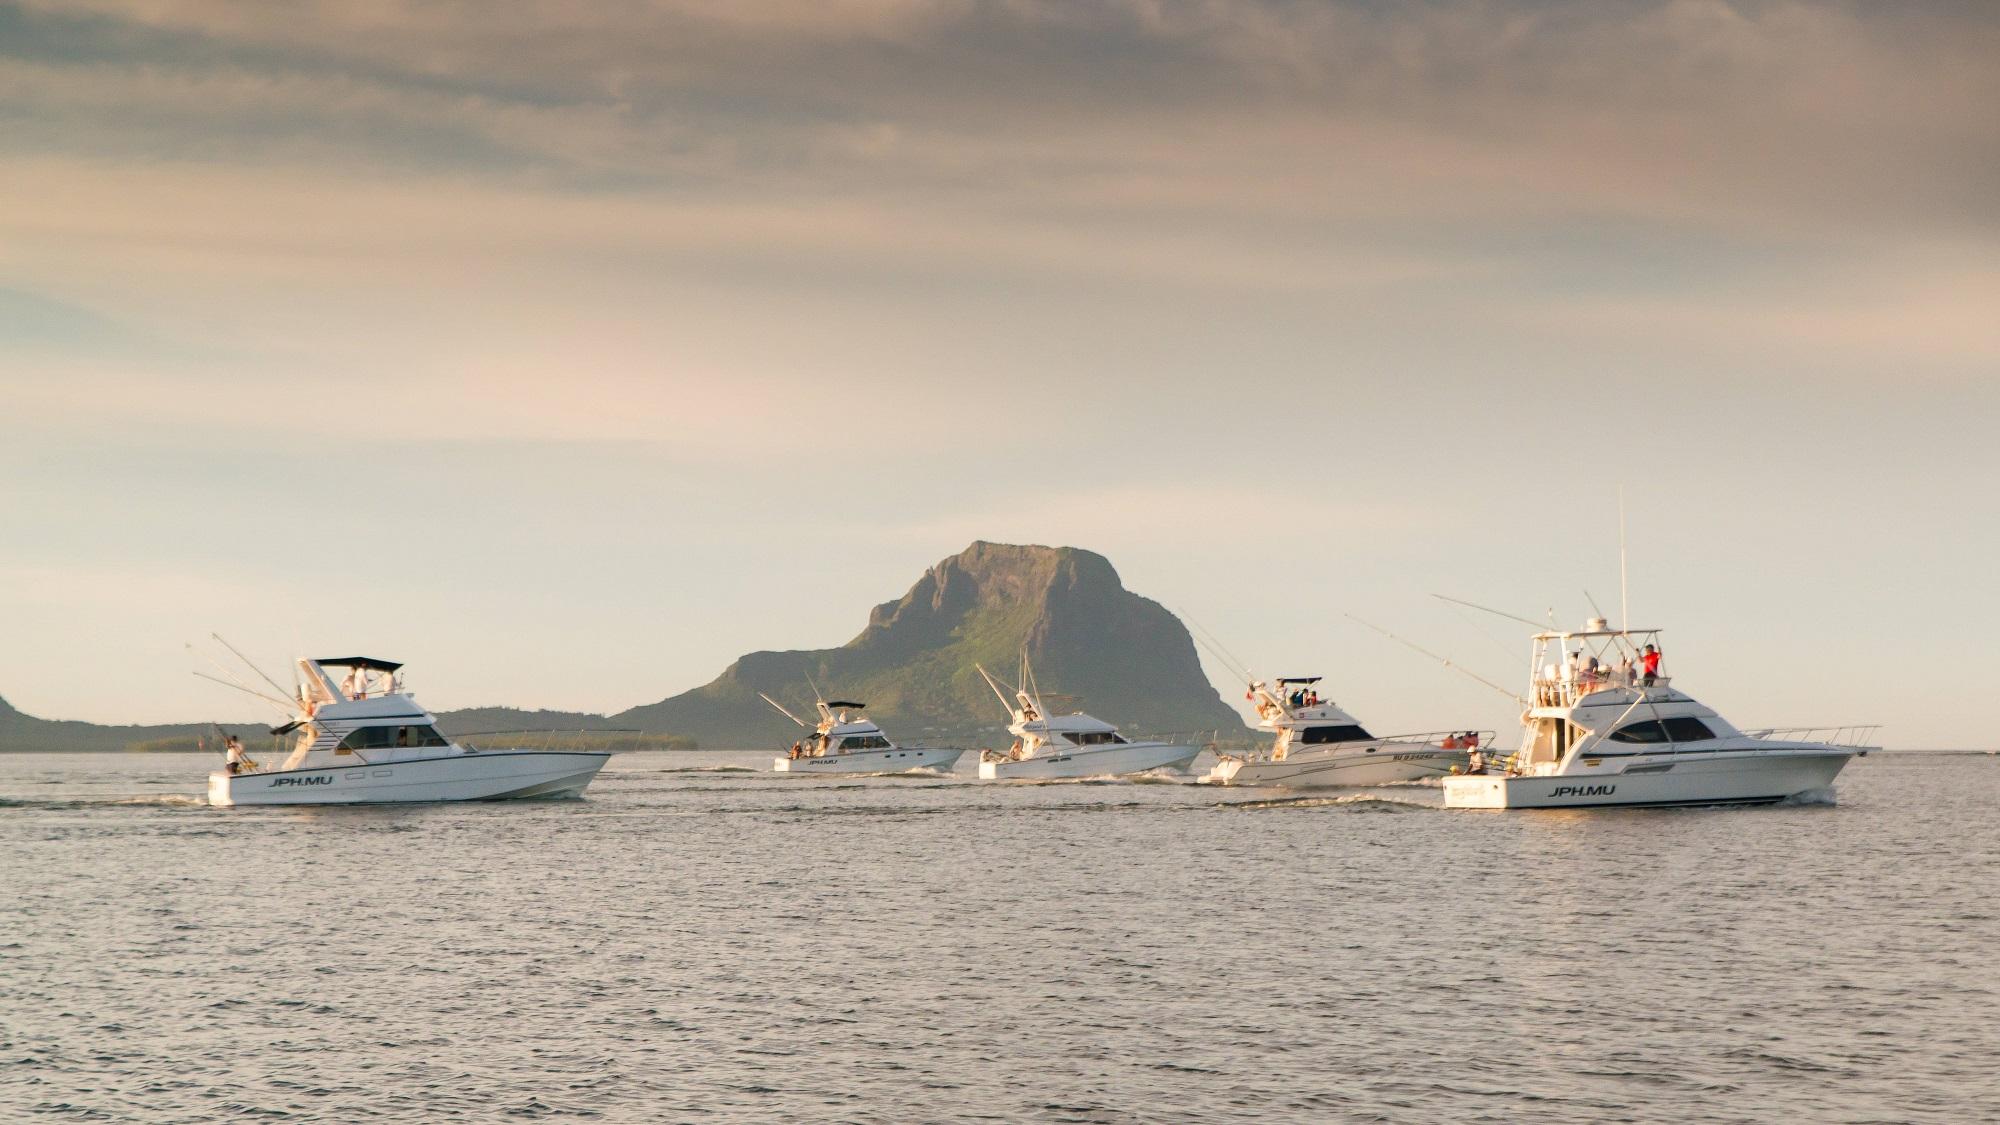 Mauritius Billfish release International Tournament